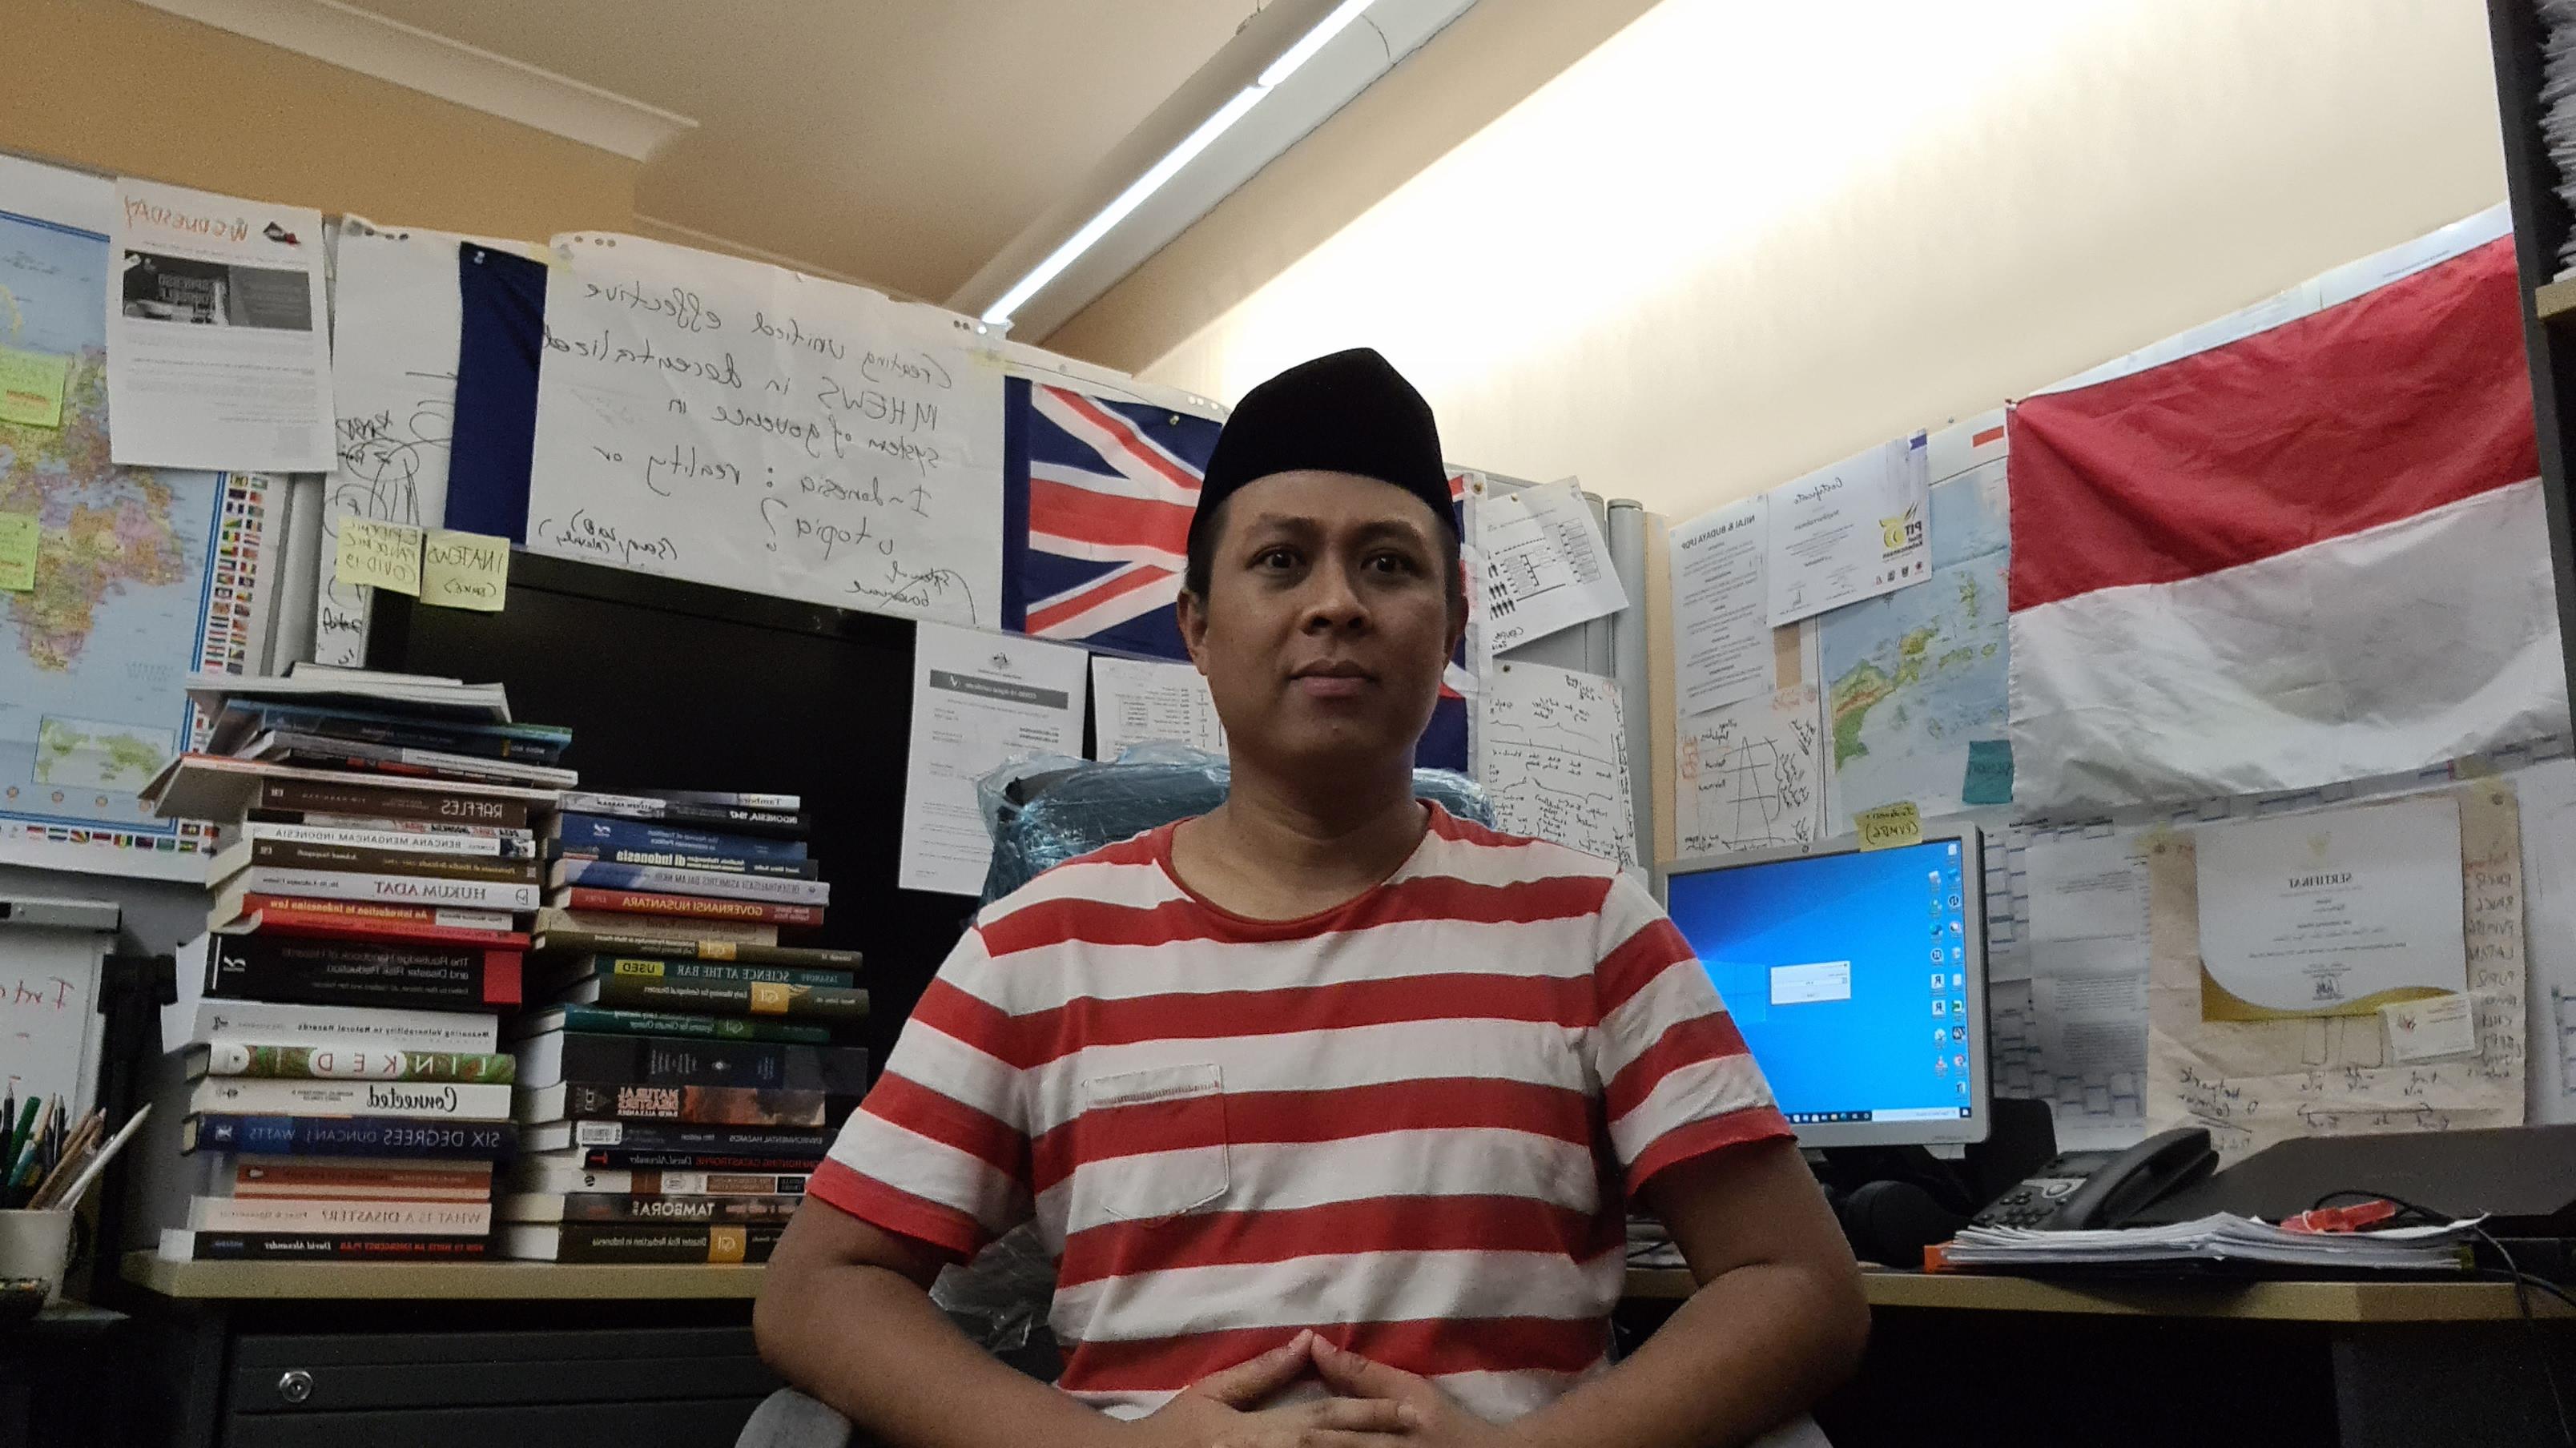 Mujiburrahman at his PhD office at Charles Darwin University, Australia. Source: Personal documentation